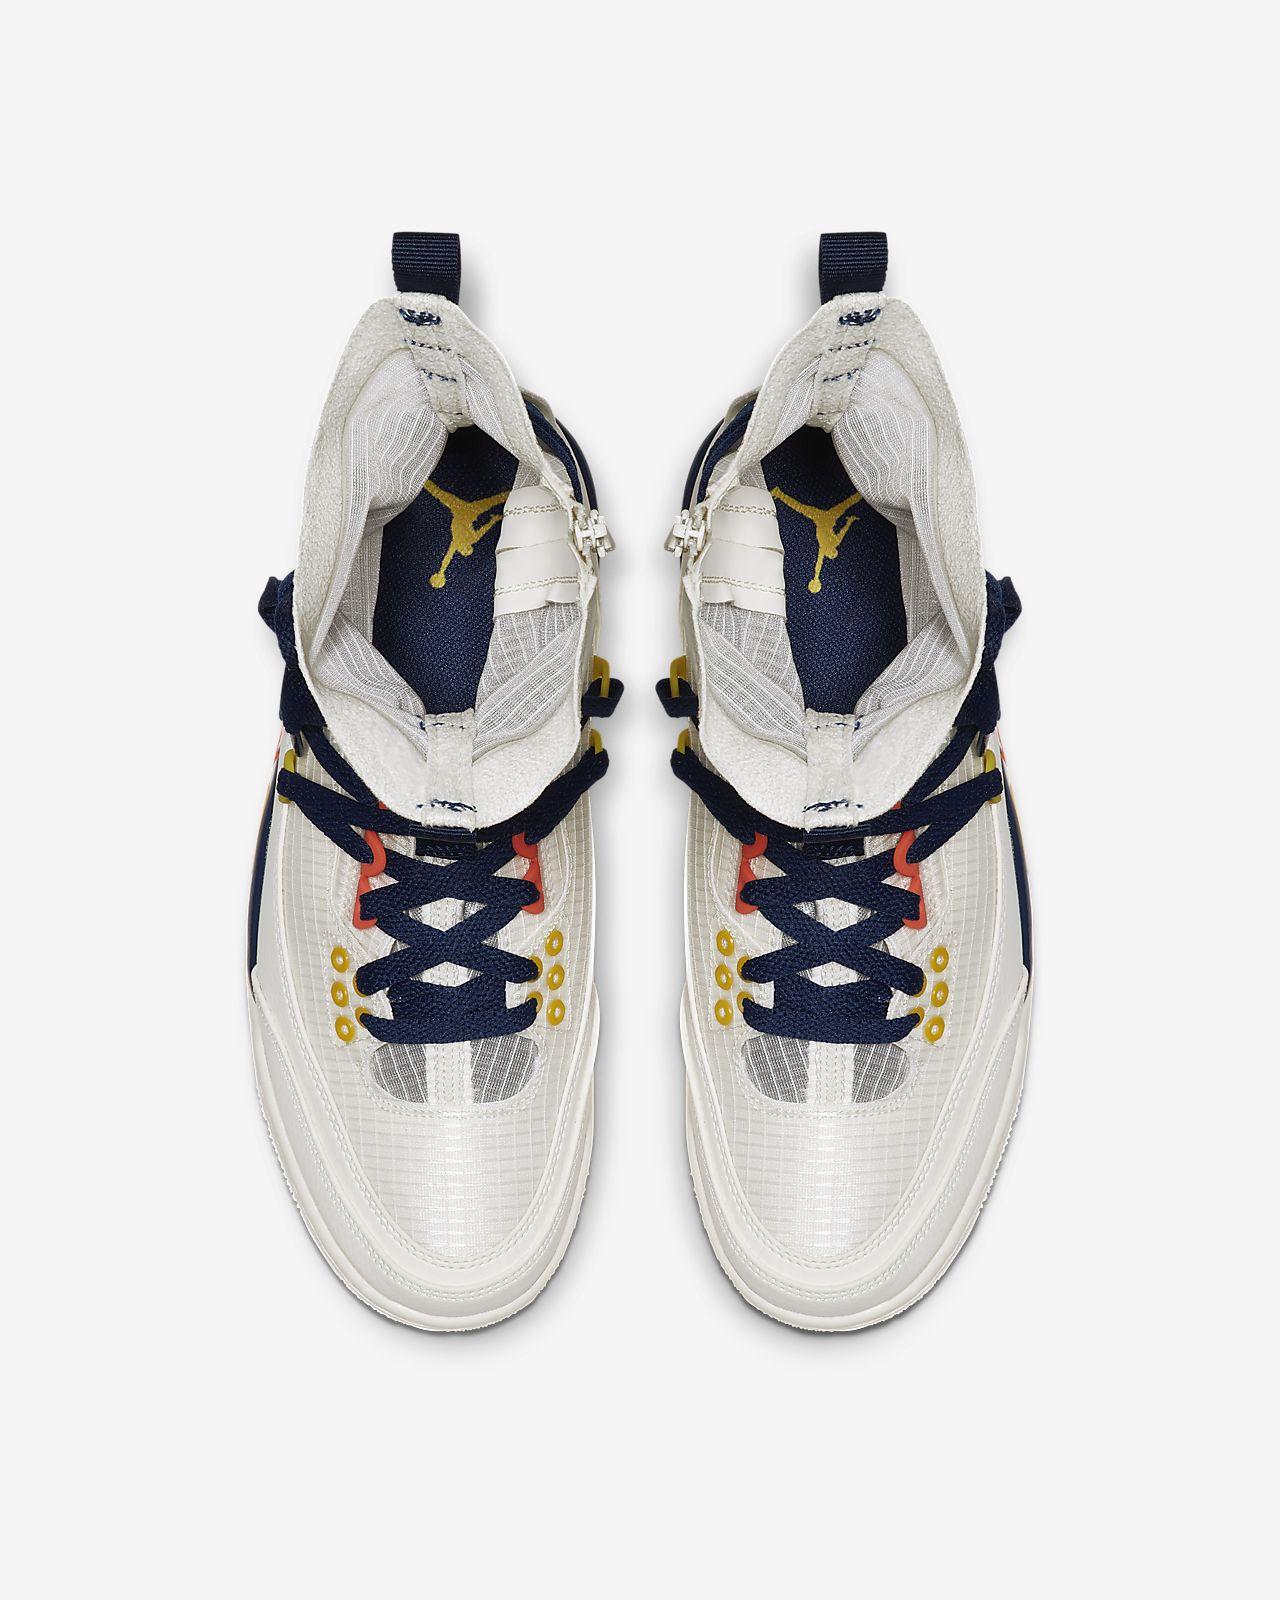 39587f264fee3f Air Jordan 3 Retro Explorer Lite XX Women s Shoe. Nike.com